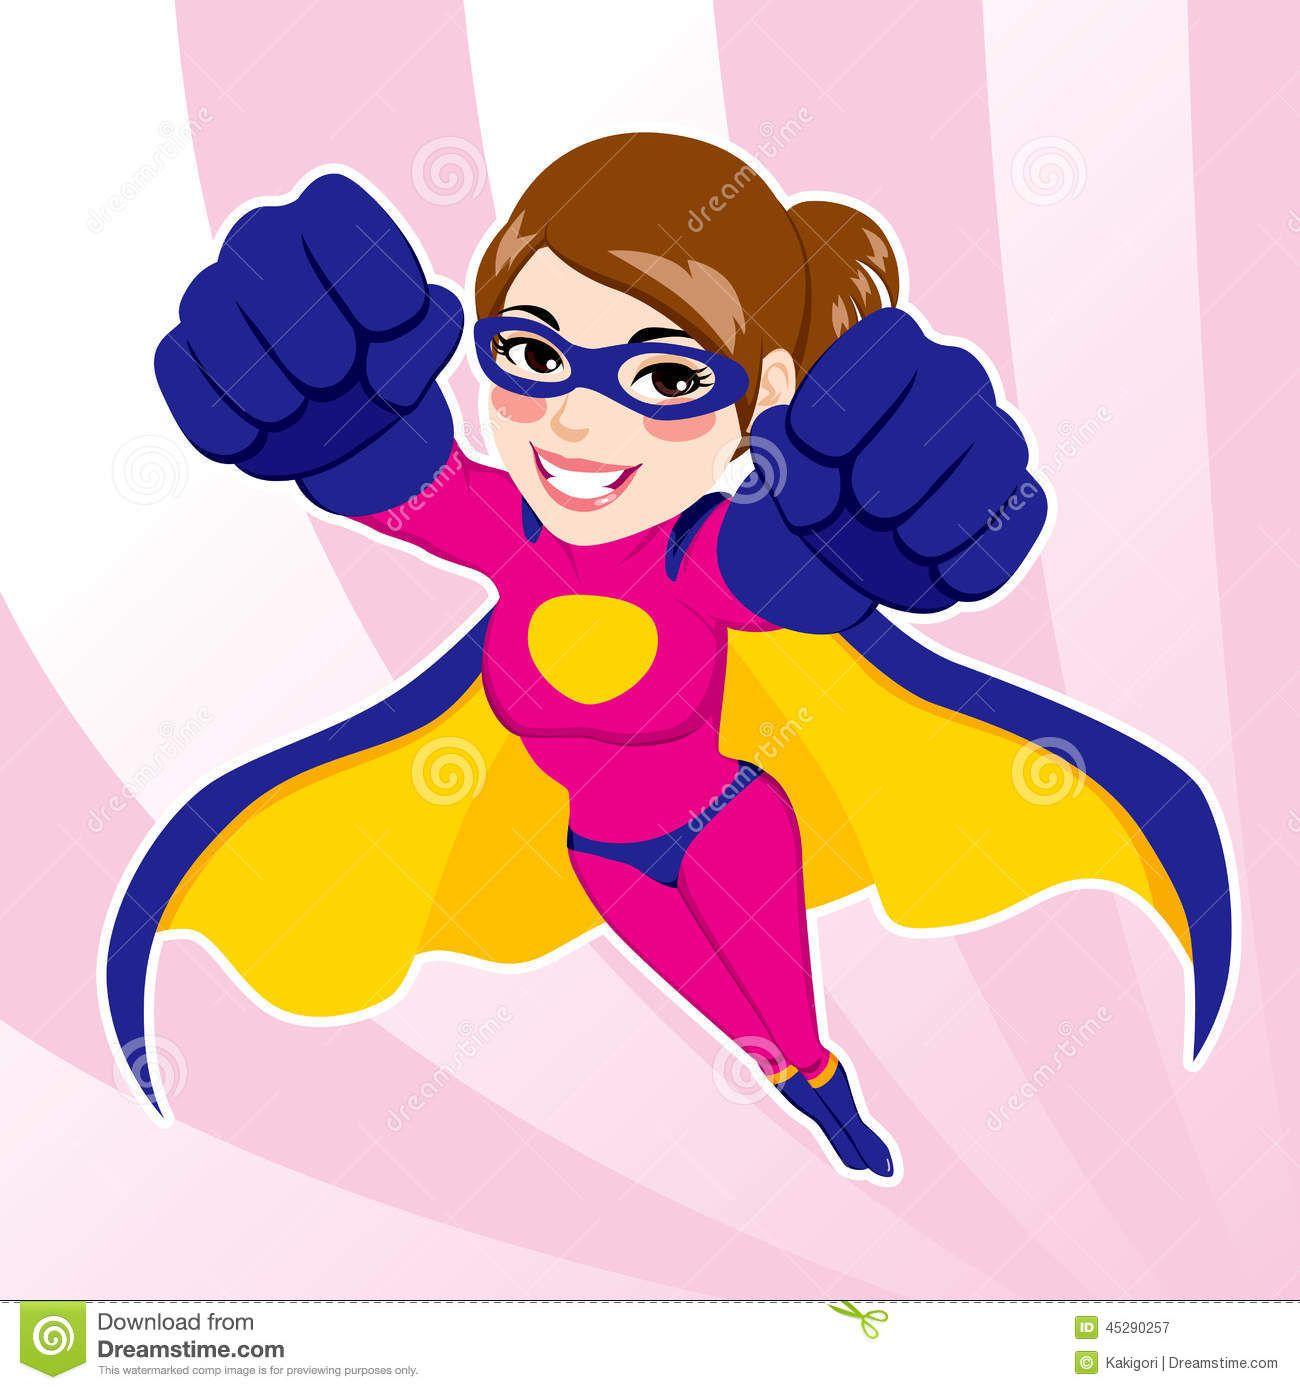 woman superheroes clipart.